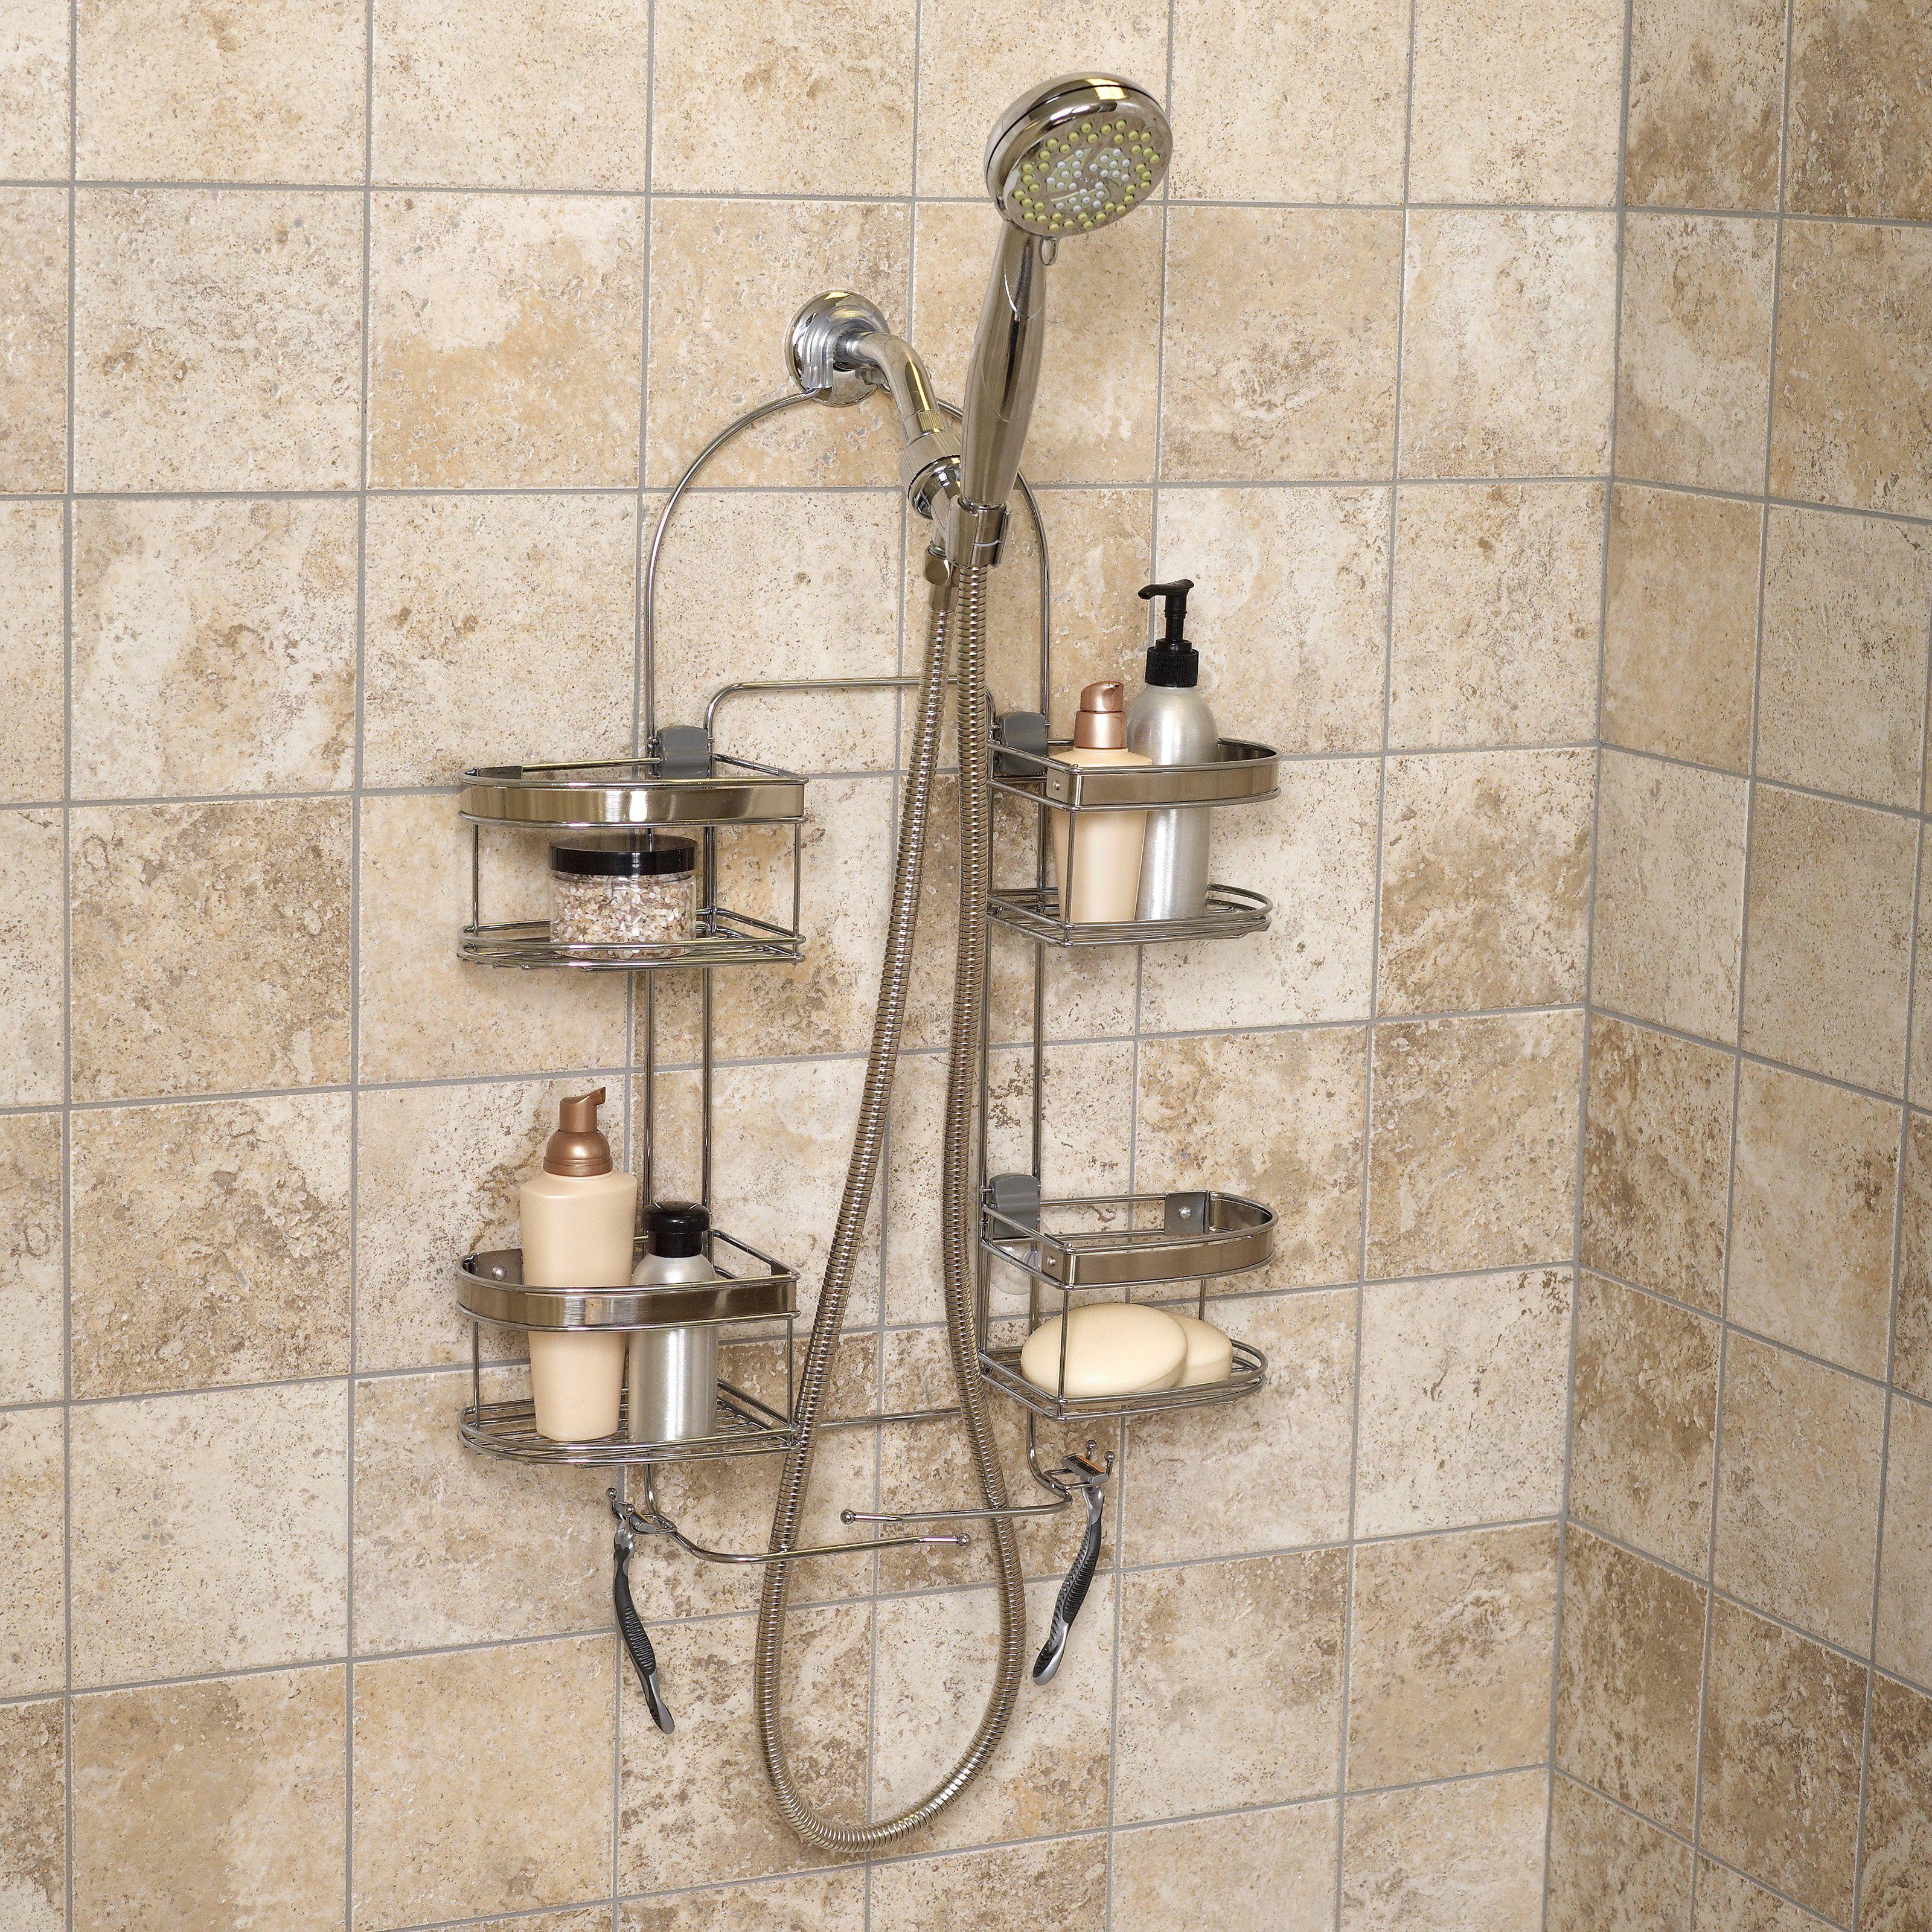 Shower Head Shower Caddy Reclaimed Wood Shower Organizer Rustic Style Shower Storage Shower Storage Recycled Pallet Recycled Pallets